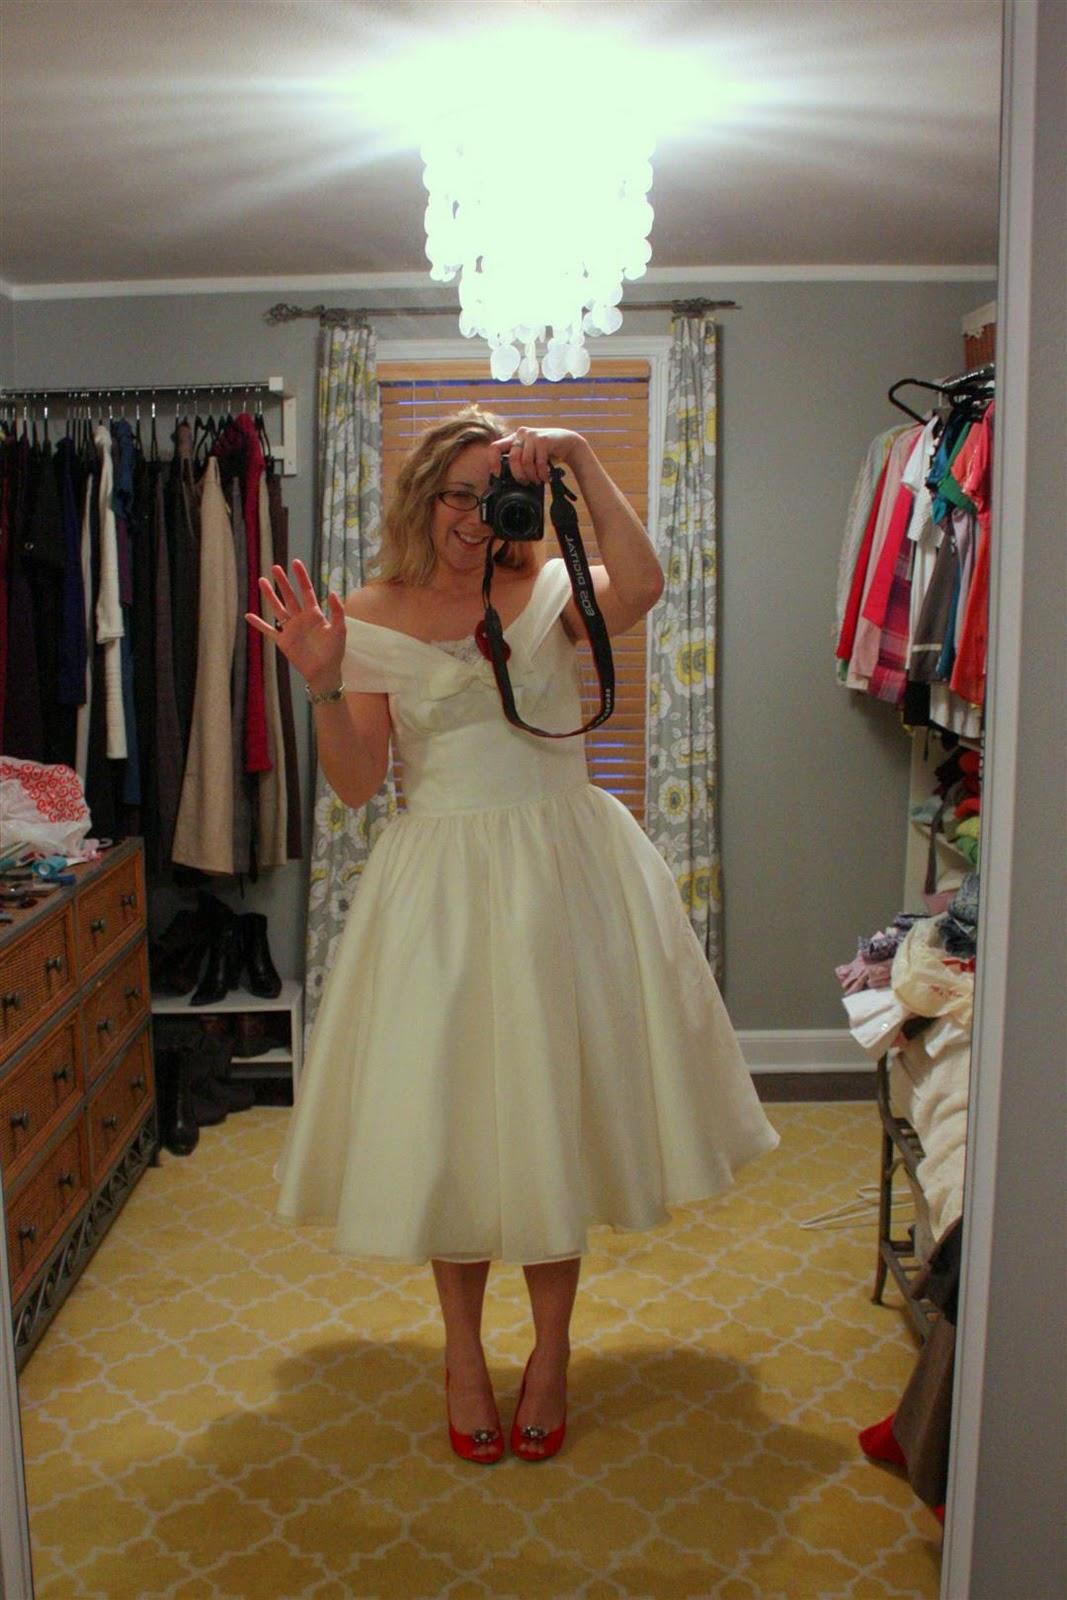 Russet Street Reno: The wedding dress